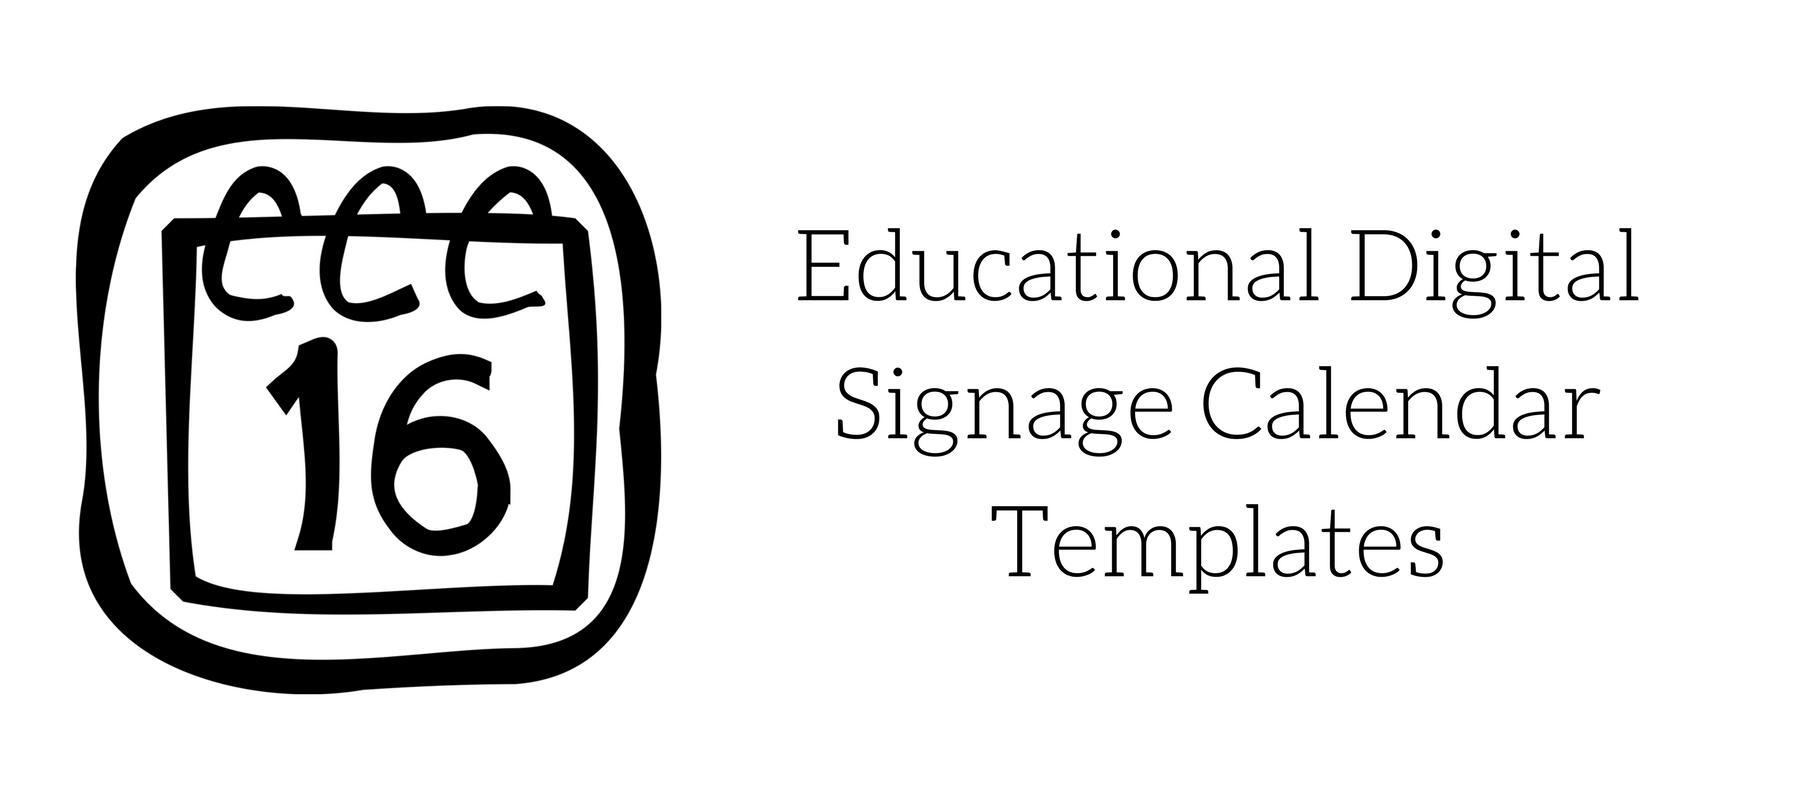 Educational Digital Signage Calendar Templates